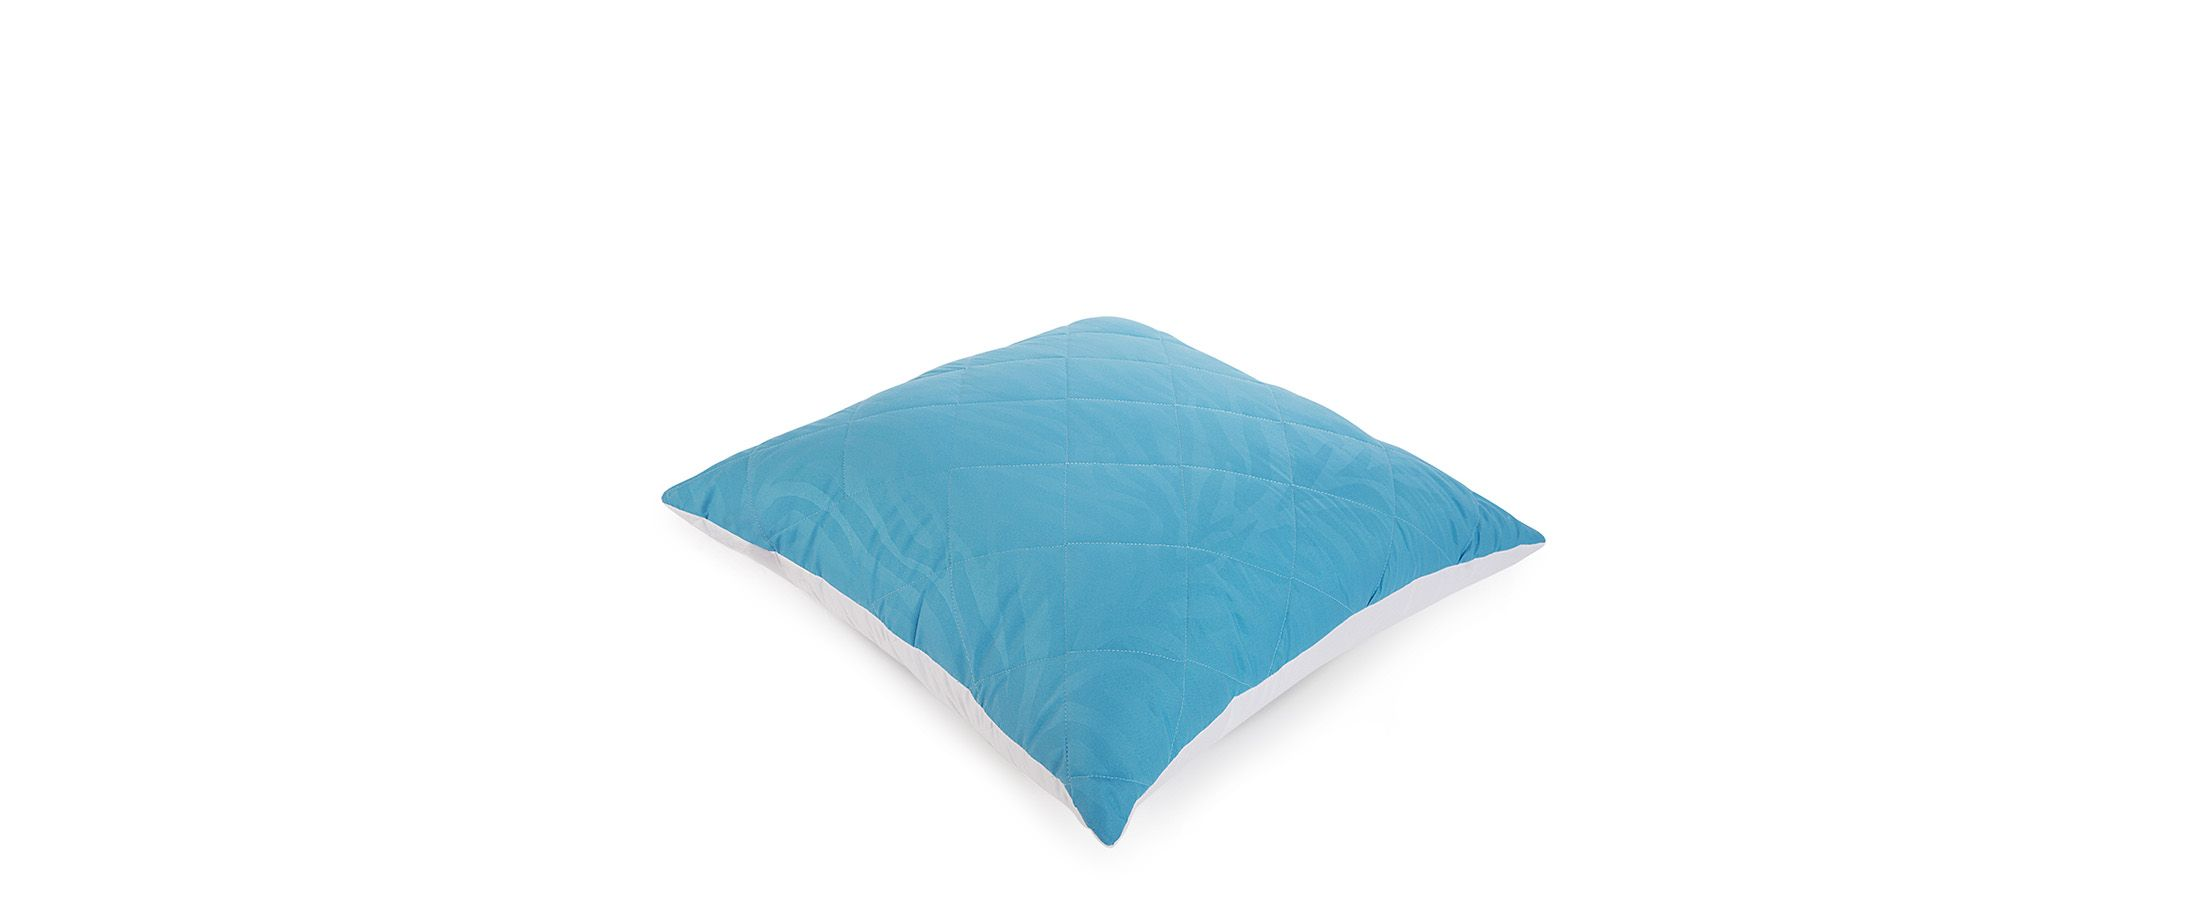 Подушка «Для тебя» 68х68 голубого цвета Модель 4004 от MOON TRADE